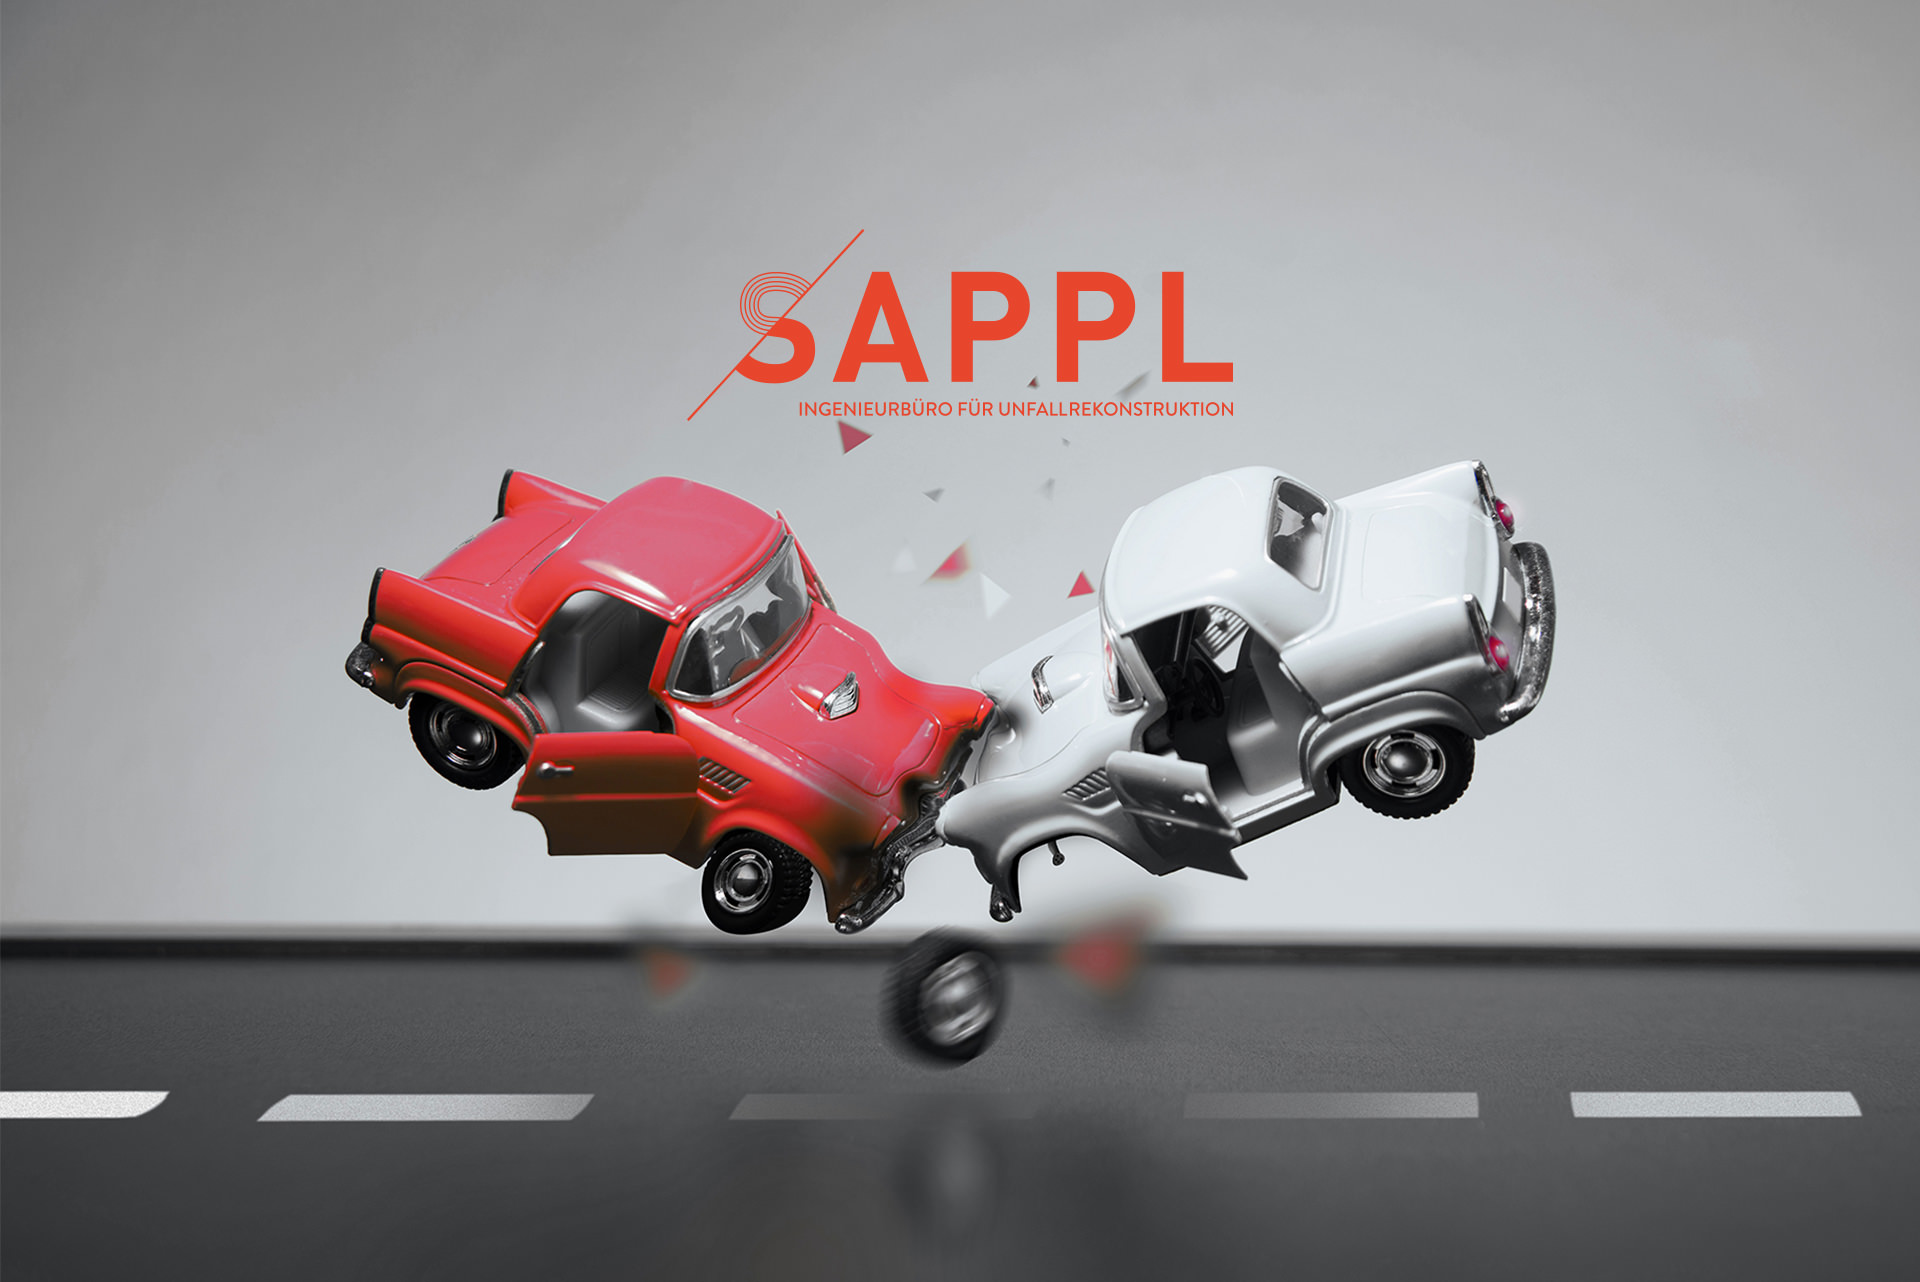 Unfallrekonstruktion - Ingenieurbüro Sappl - Unfallgutachten ...